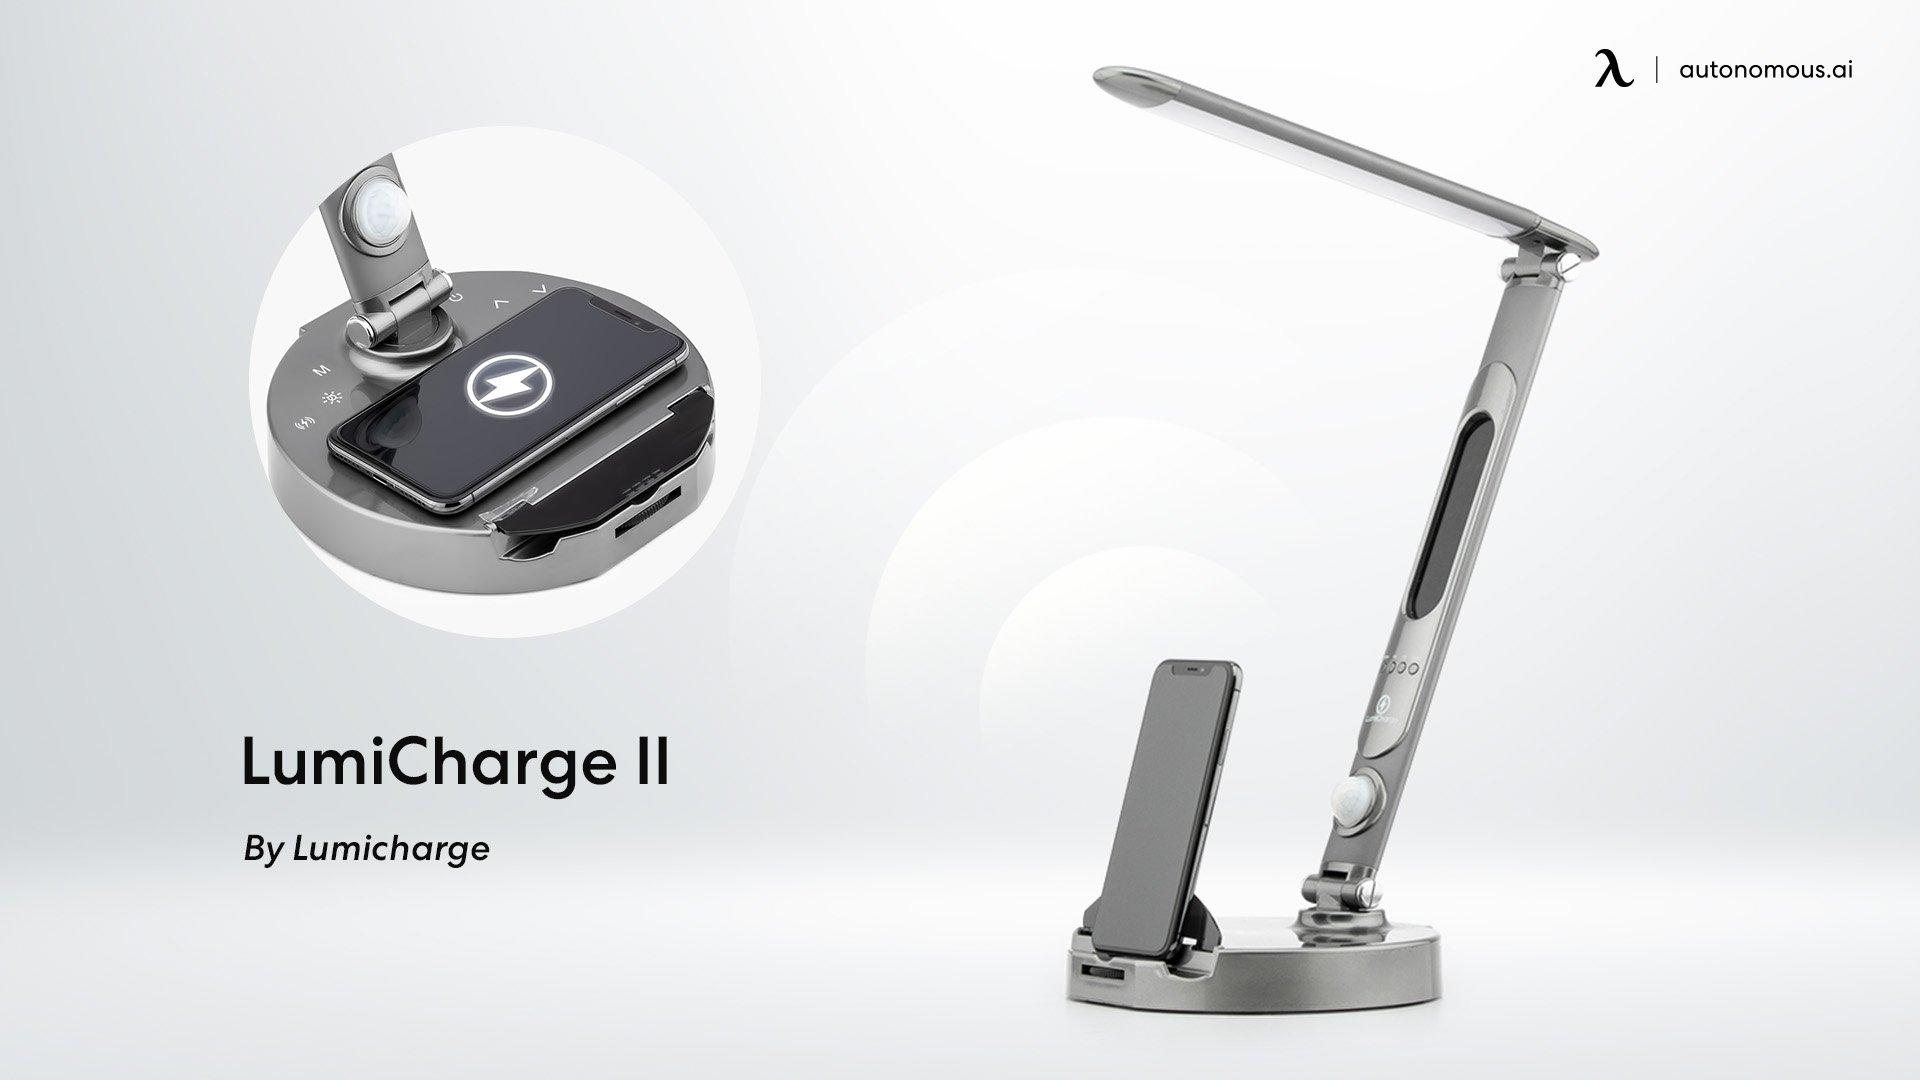 Lumi Charge II